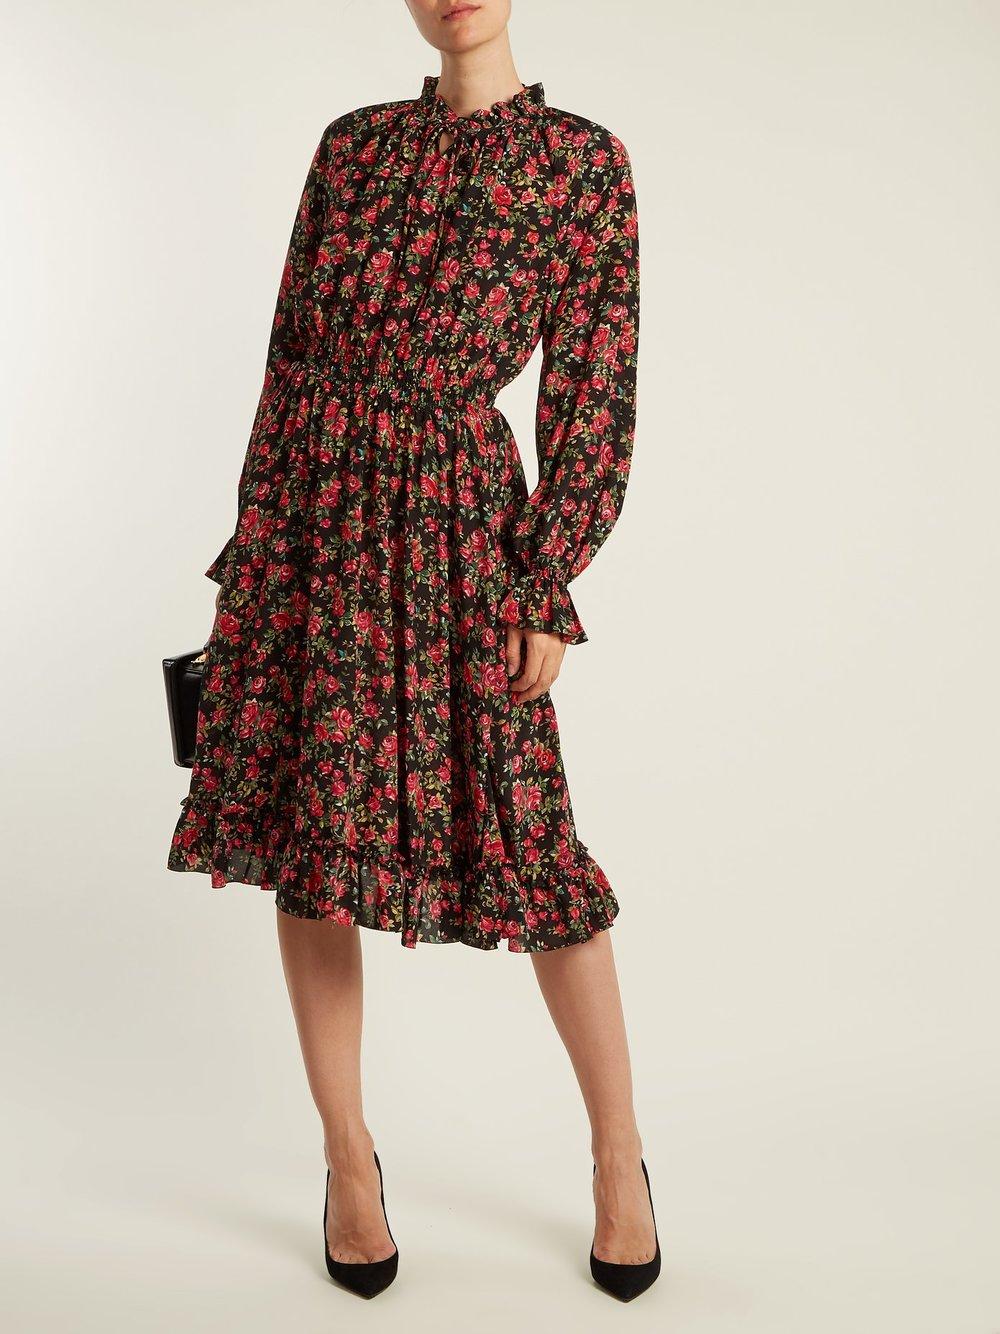 Dolce and Gabbana High Neck Floral Print Silk Dress SAle.jpg